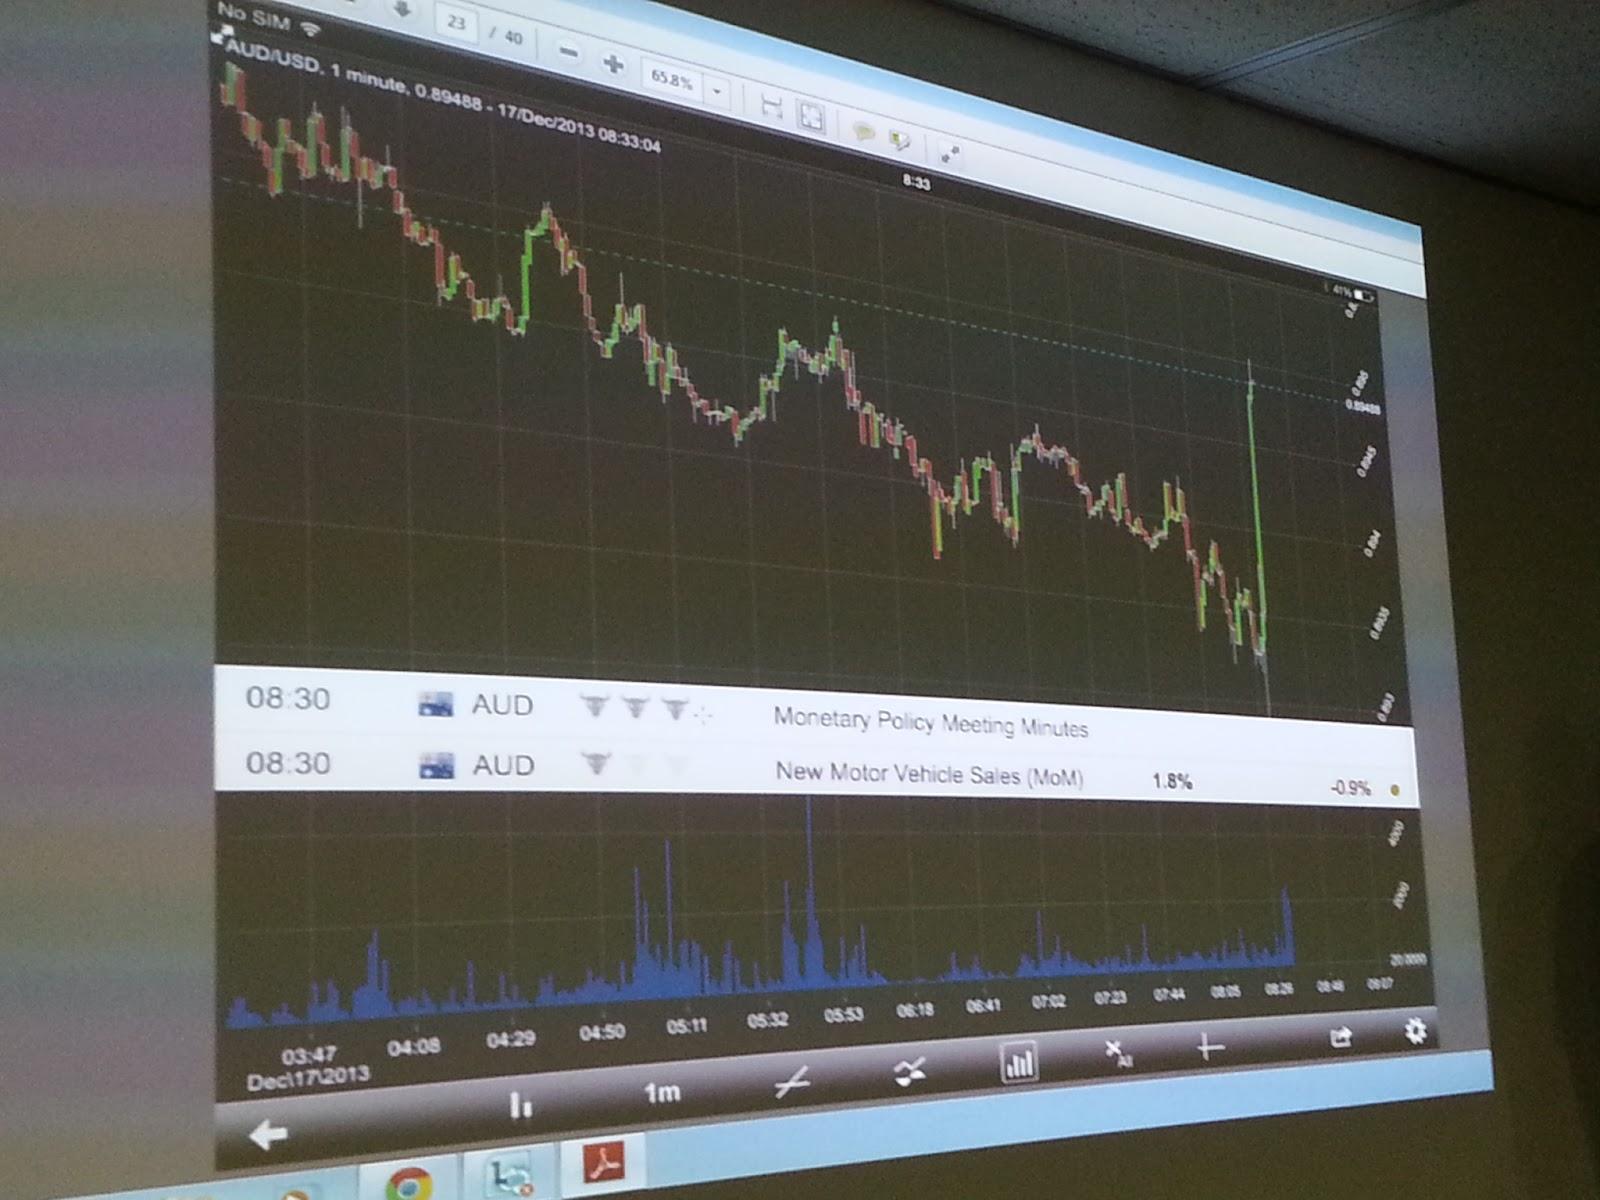 Option trading seminar in singapore